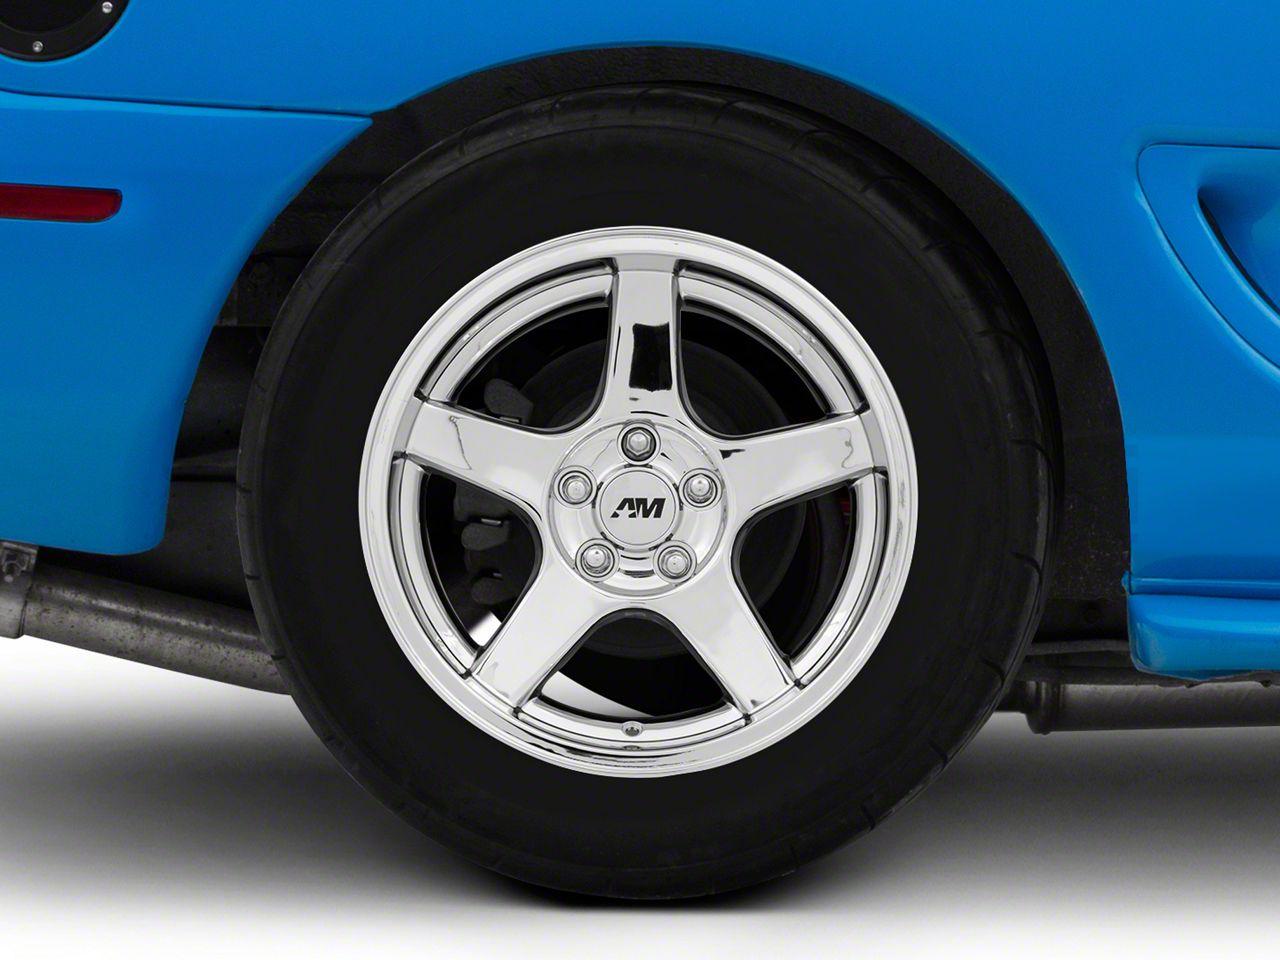 Deep Dish 2003 Cobra Style Chrome Wheel - 17x10.5 - Rear Only (94-04 All)